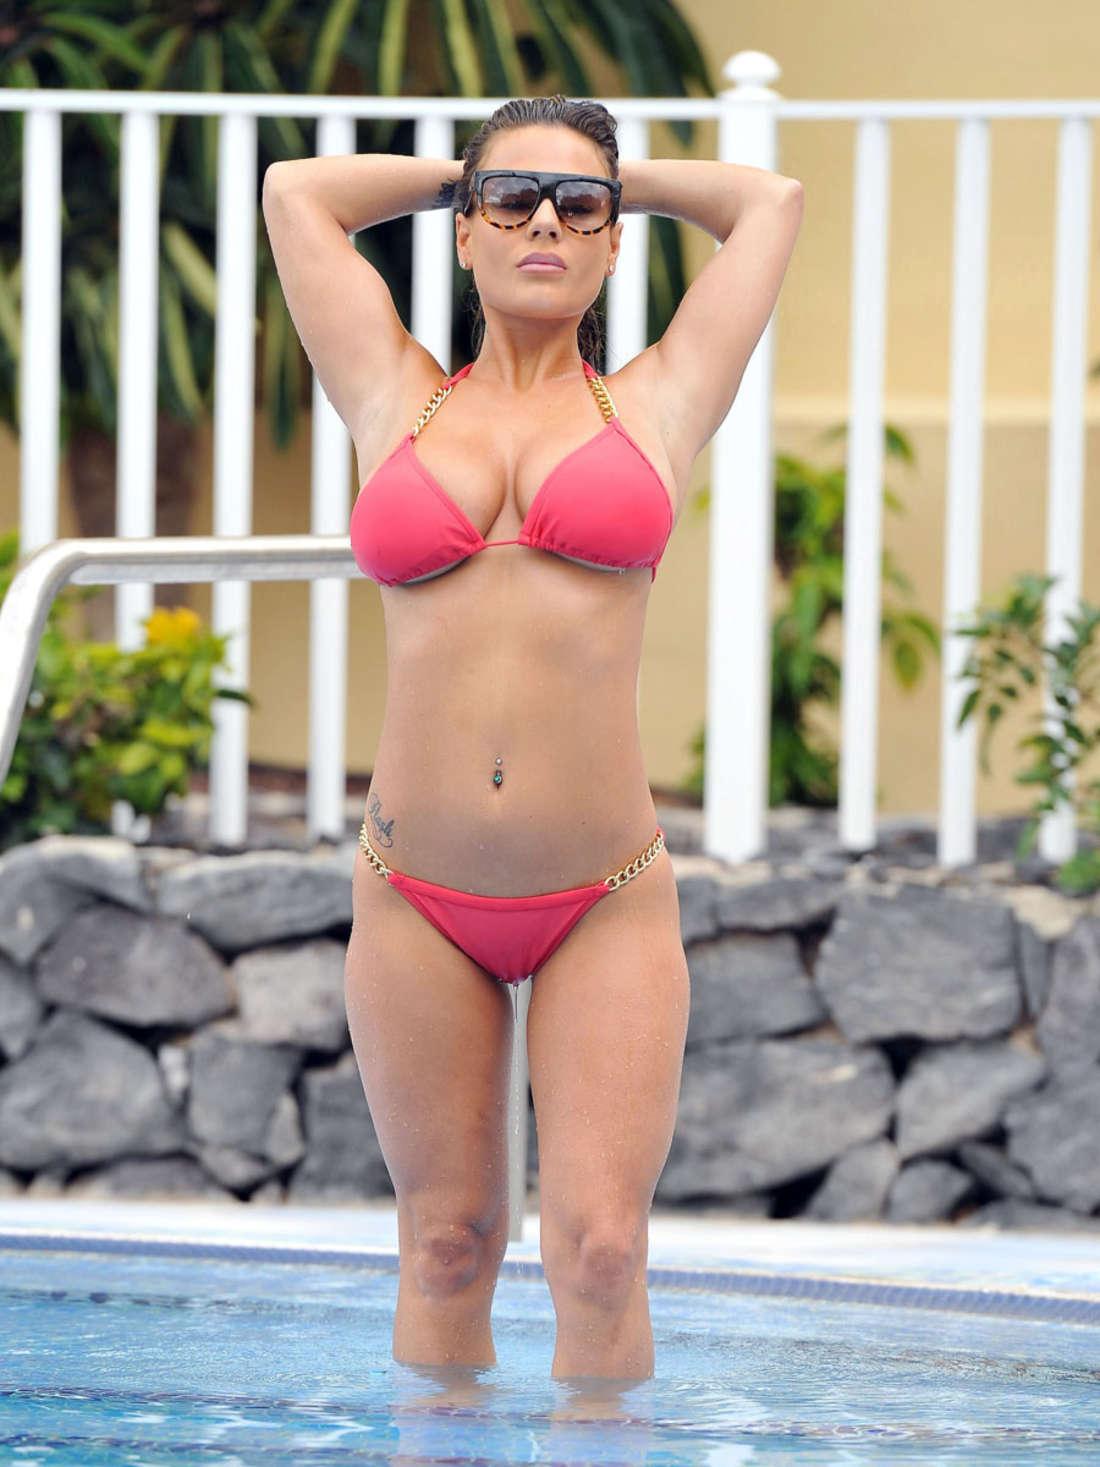 Chantelle connelly bikini - 2019 year